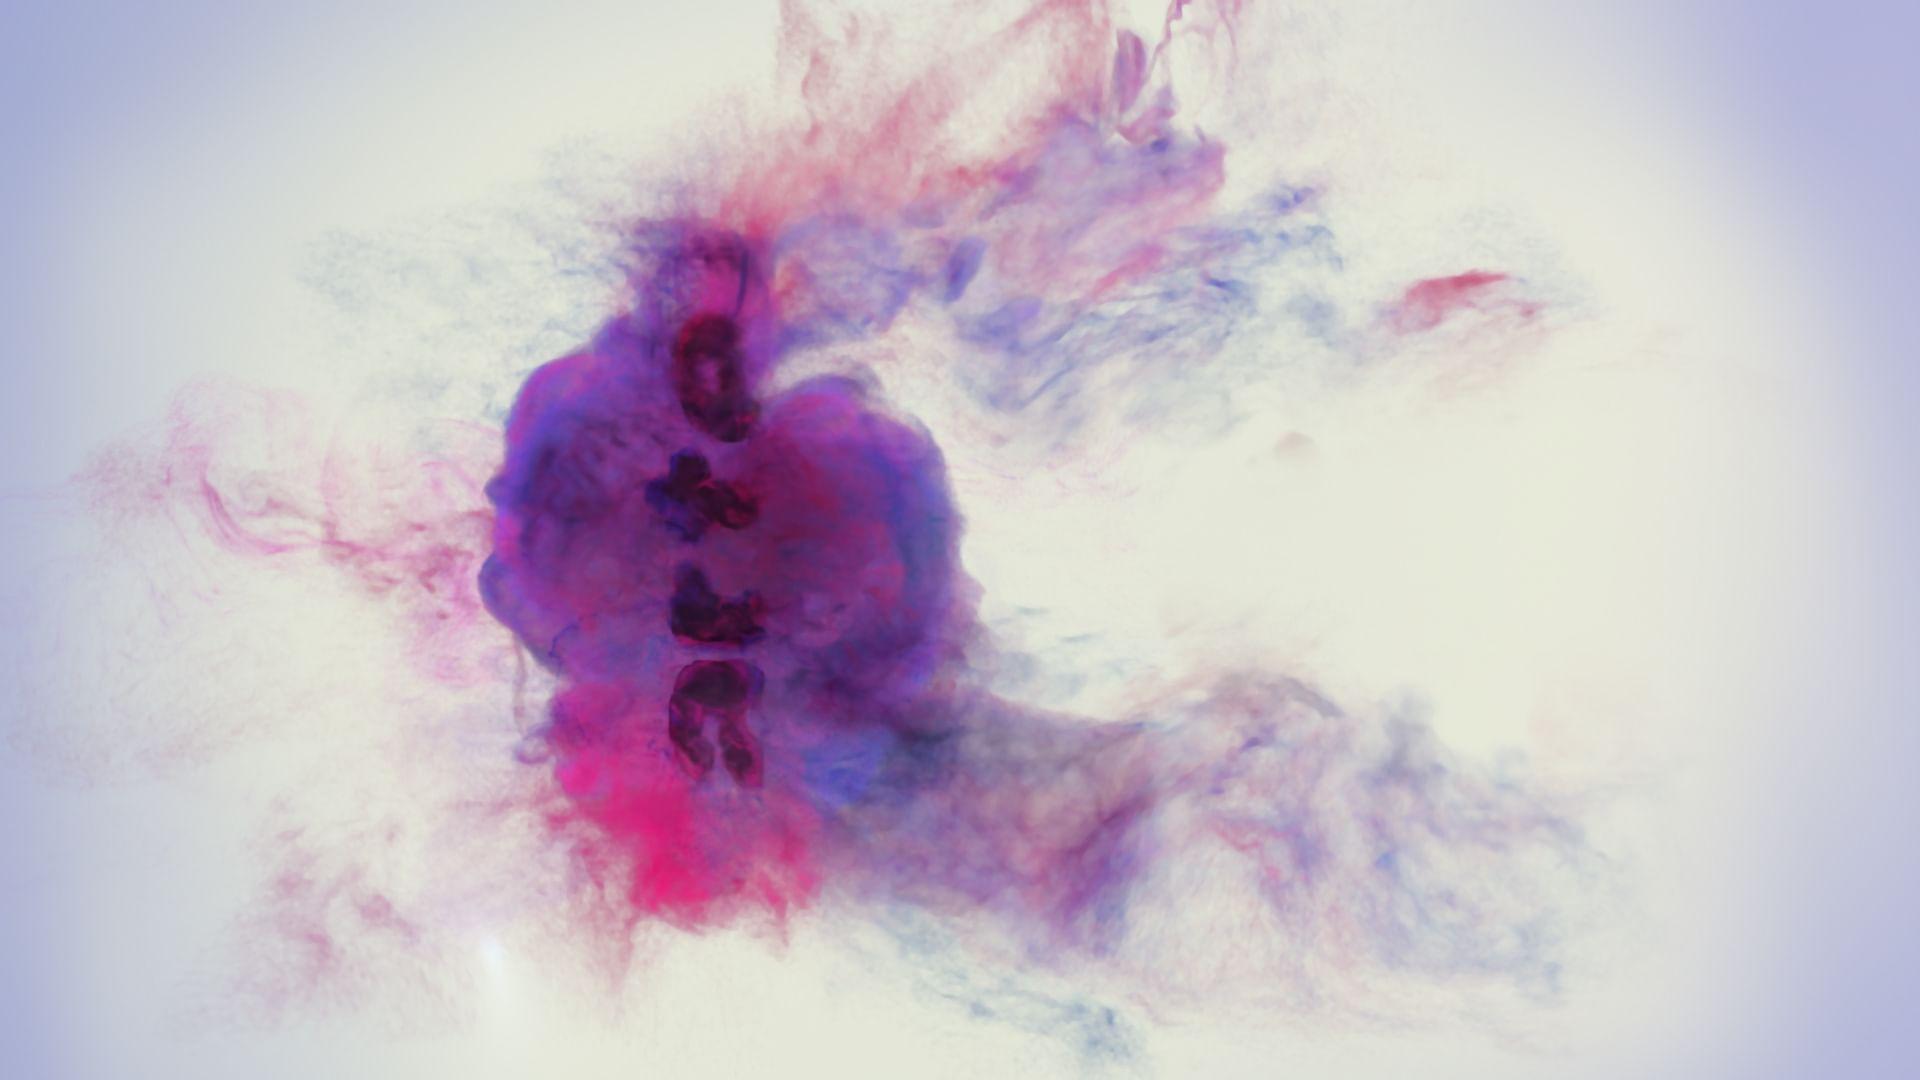 Street Photography (10/13) | Henry Chalfant. Graffiti Art